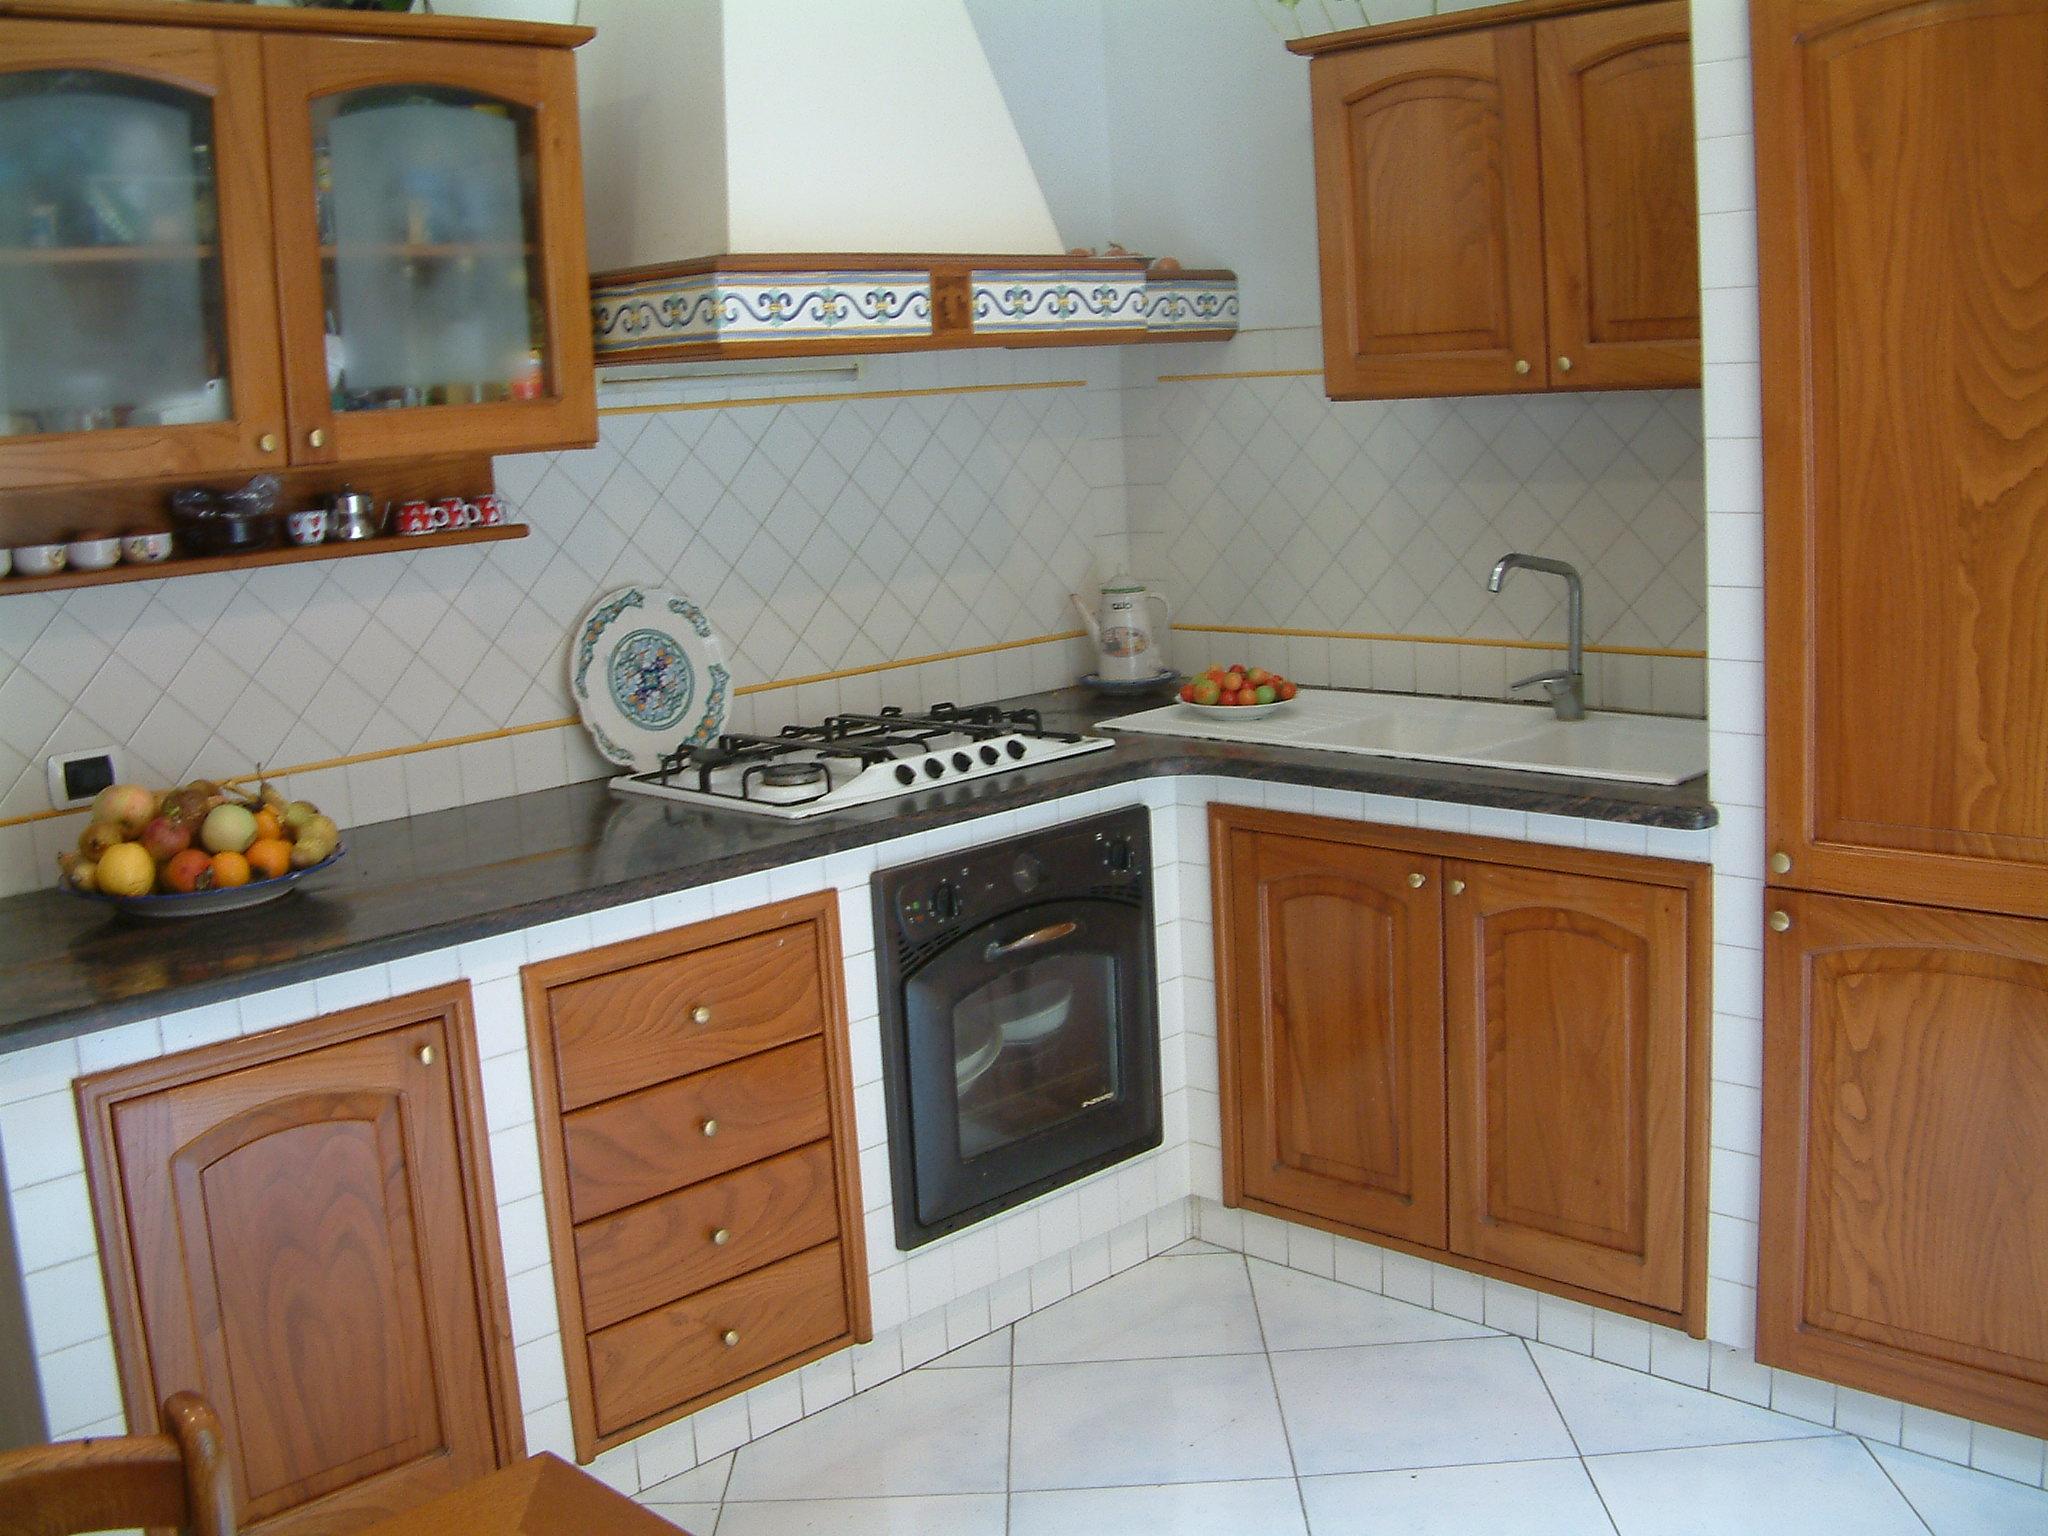 Progetti cucine in muratura rustiche foto della cucina in - Cucine in muratura rustica ...